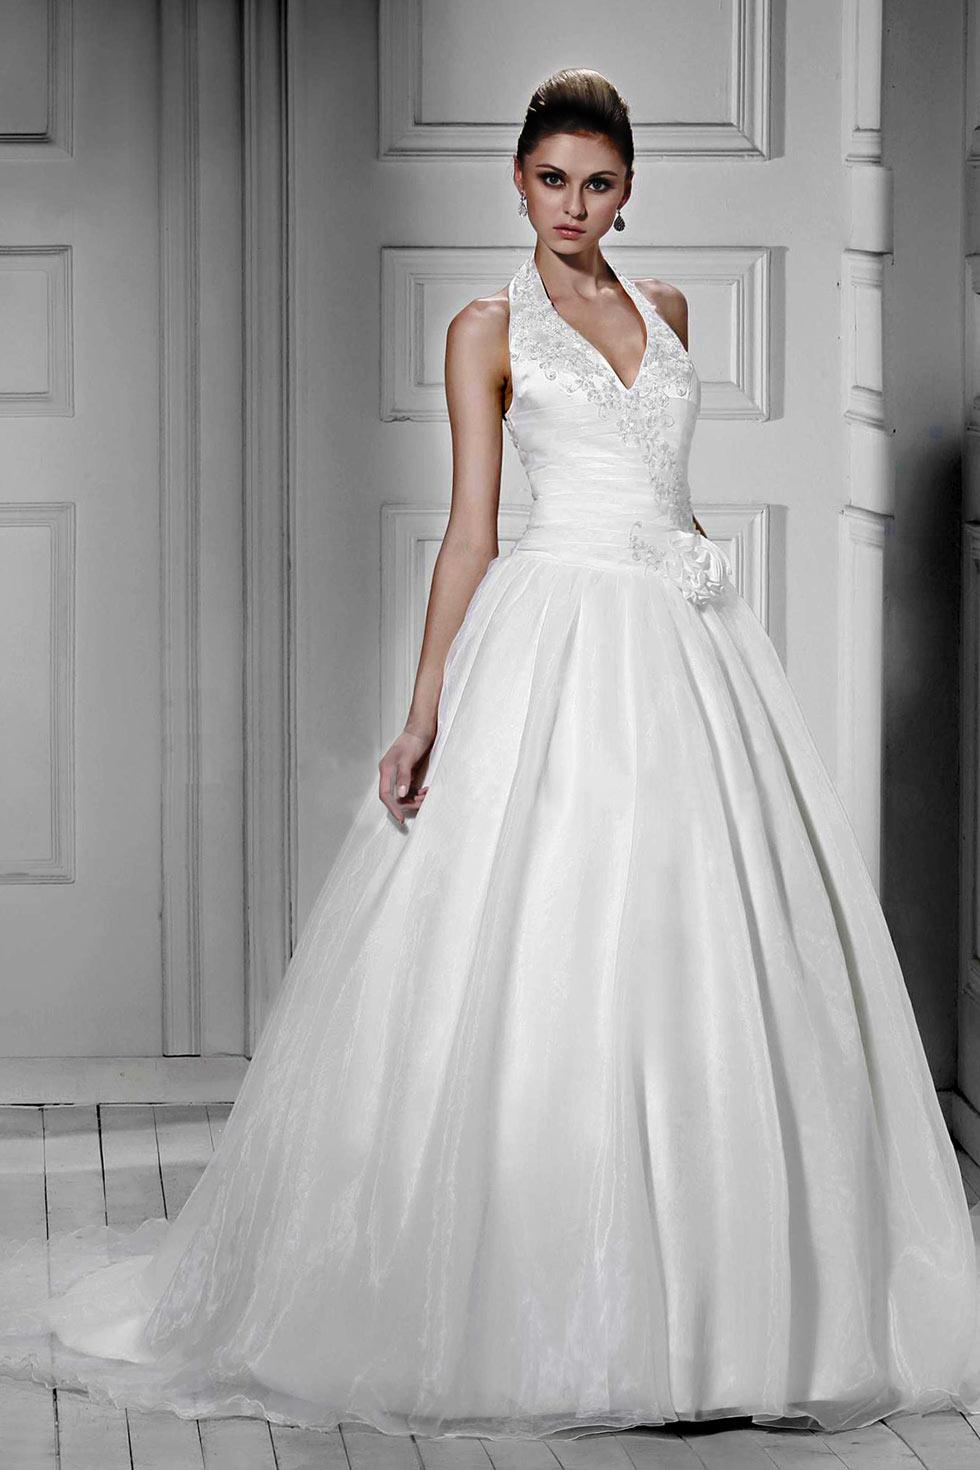 Robe de mariée princesse encolure américaine ornée dapplique – Persun.fr dc2df222a4b1